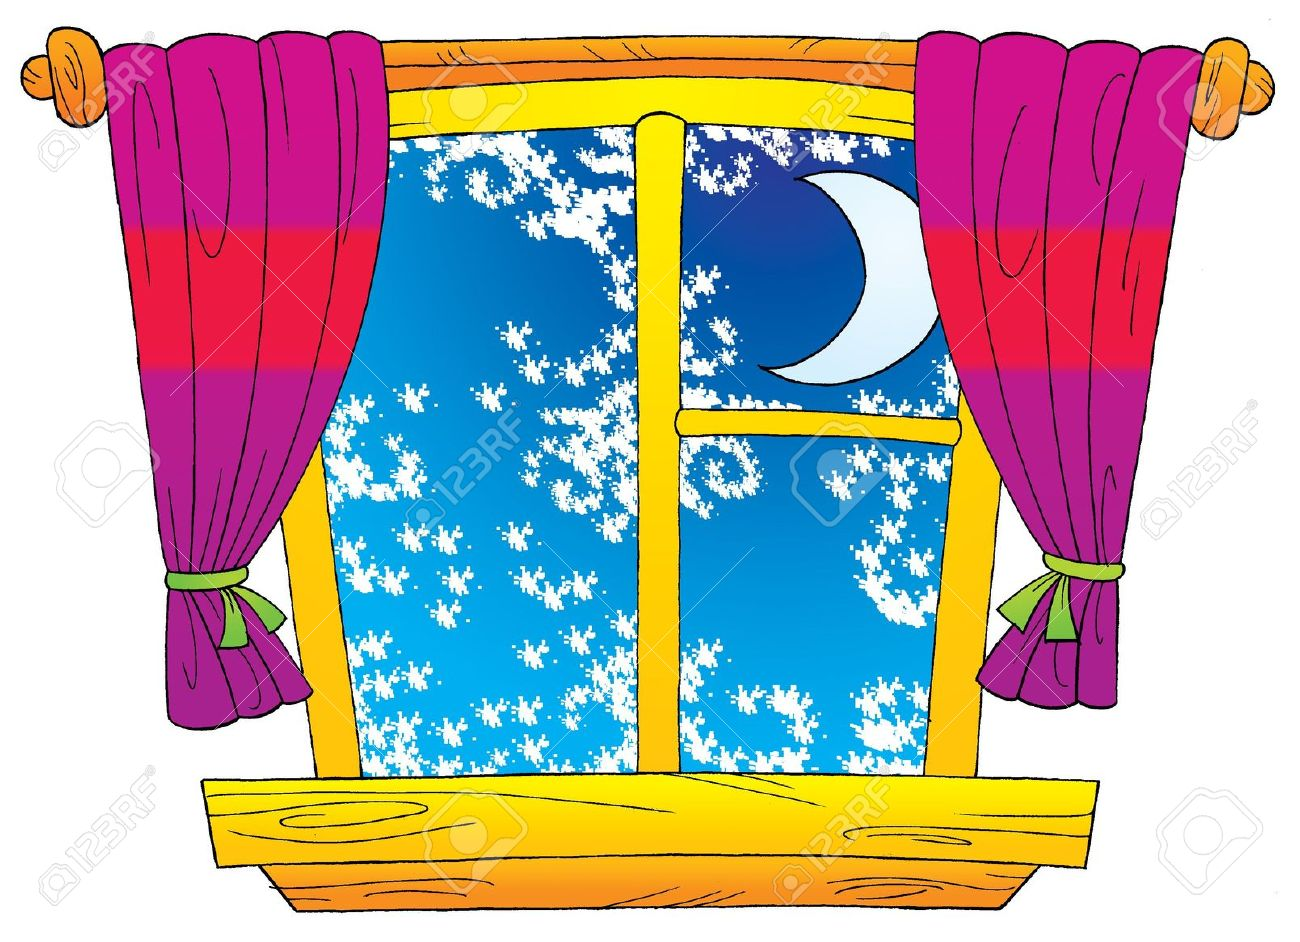 Winter clipart window. Panda free